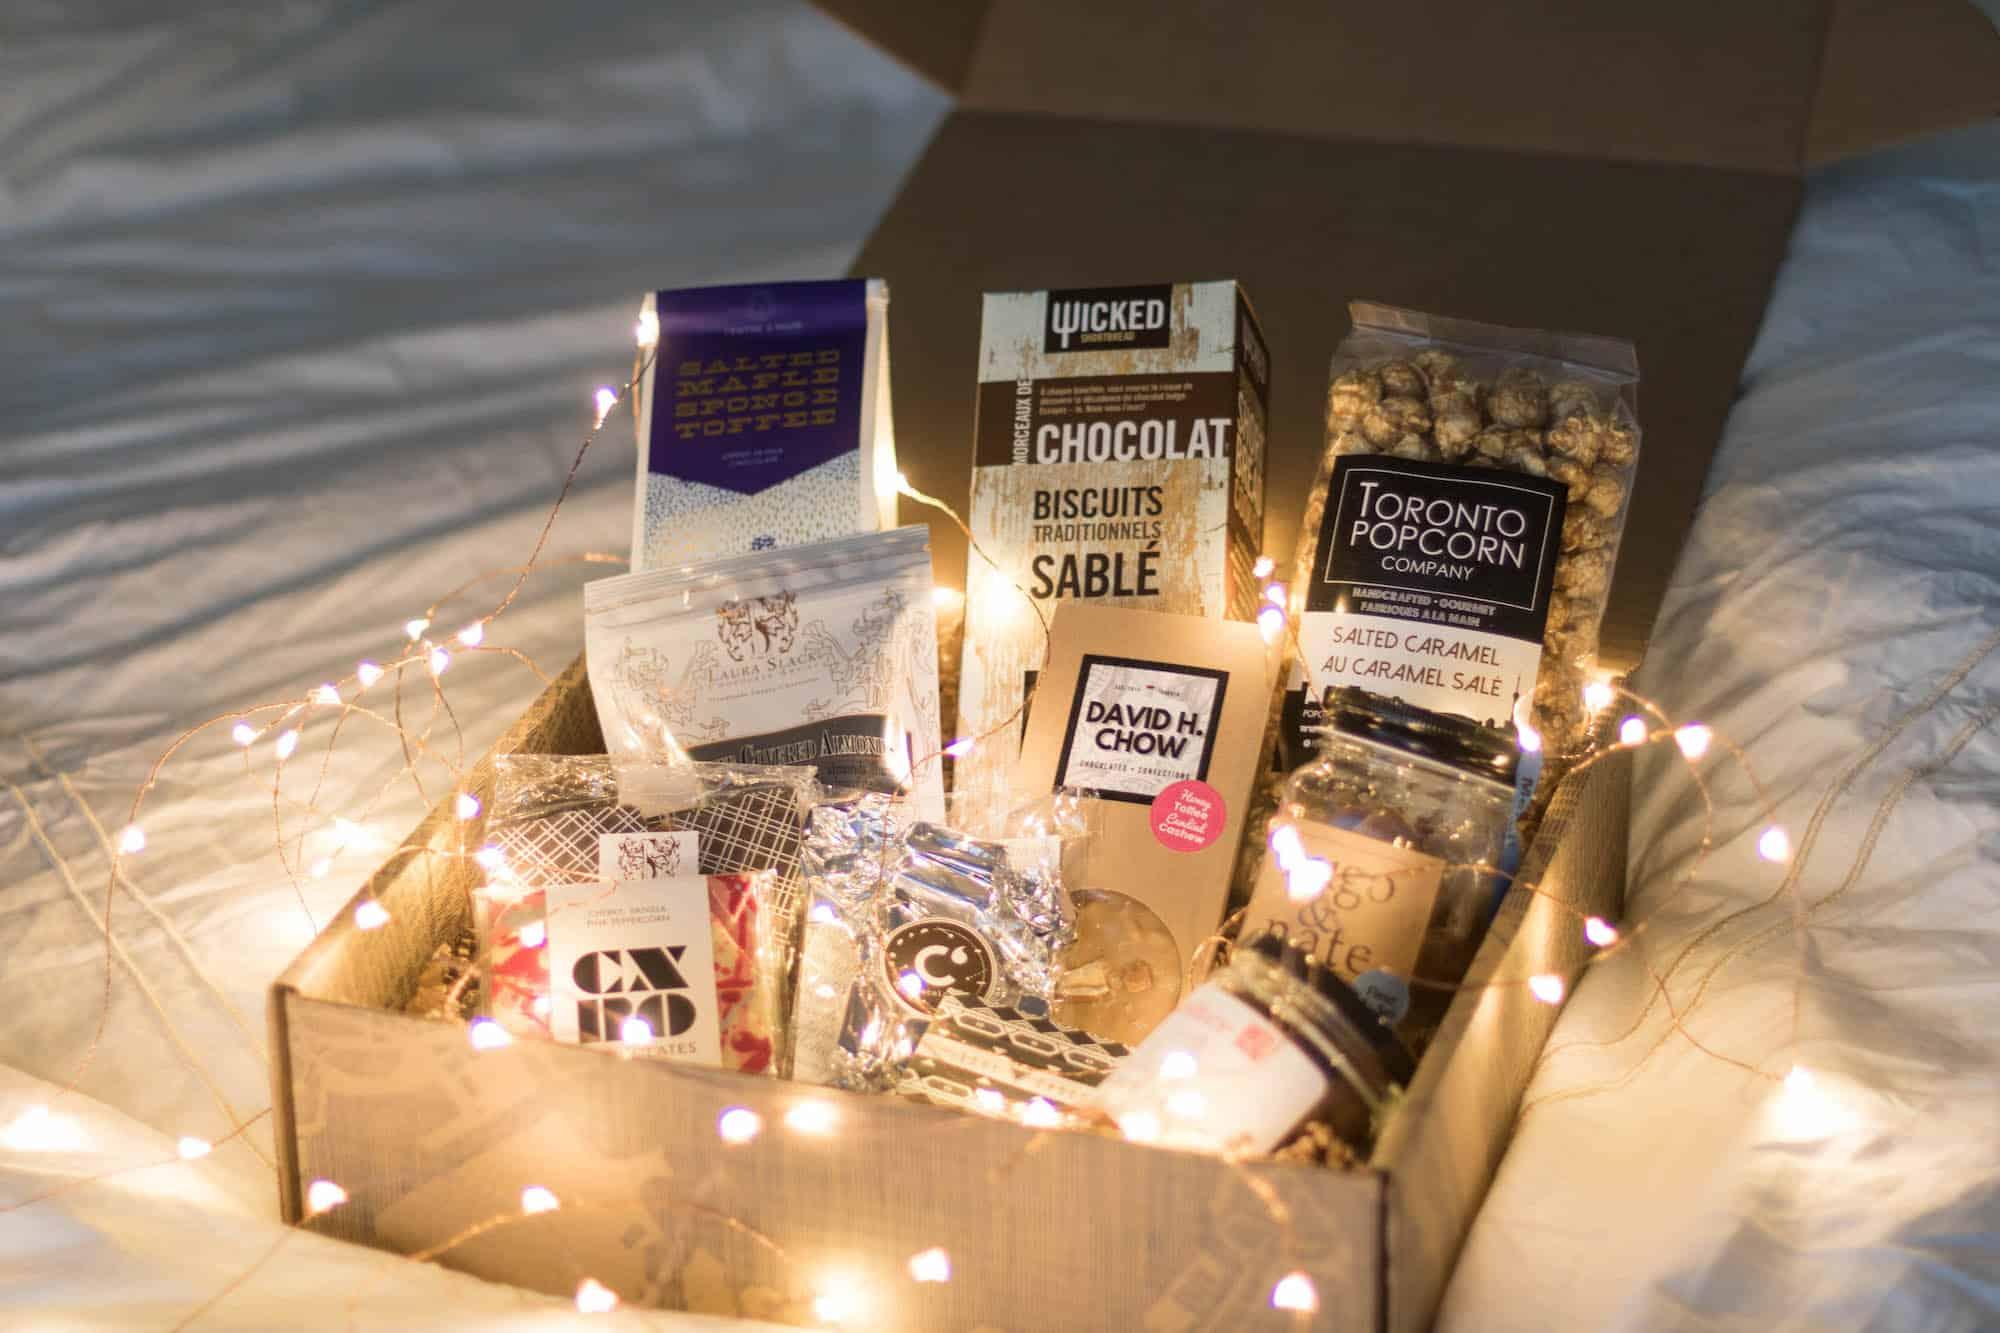 Toronto holiday gift basket from Saul Good Gift Co.